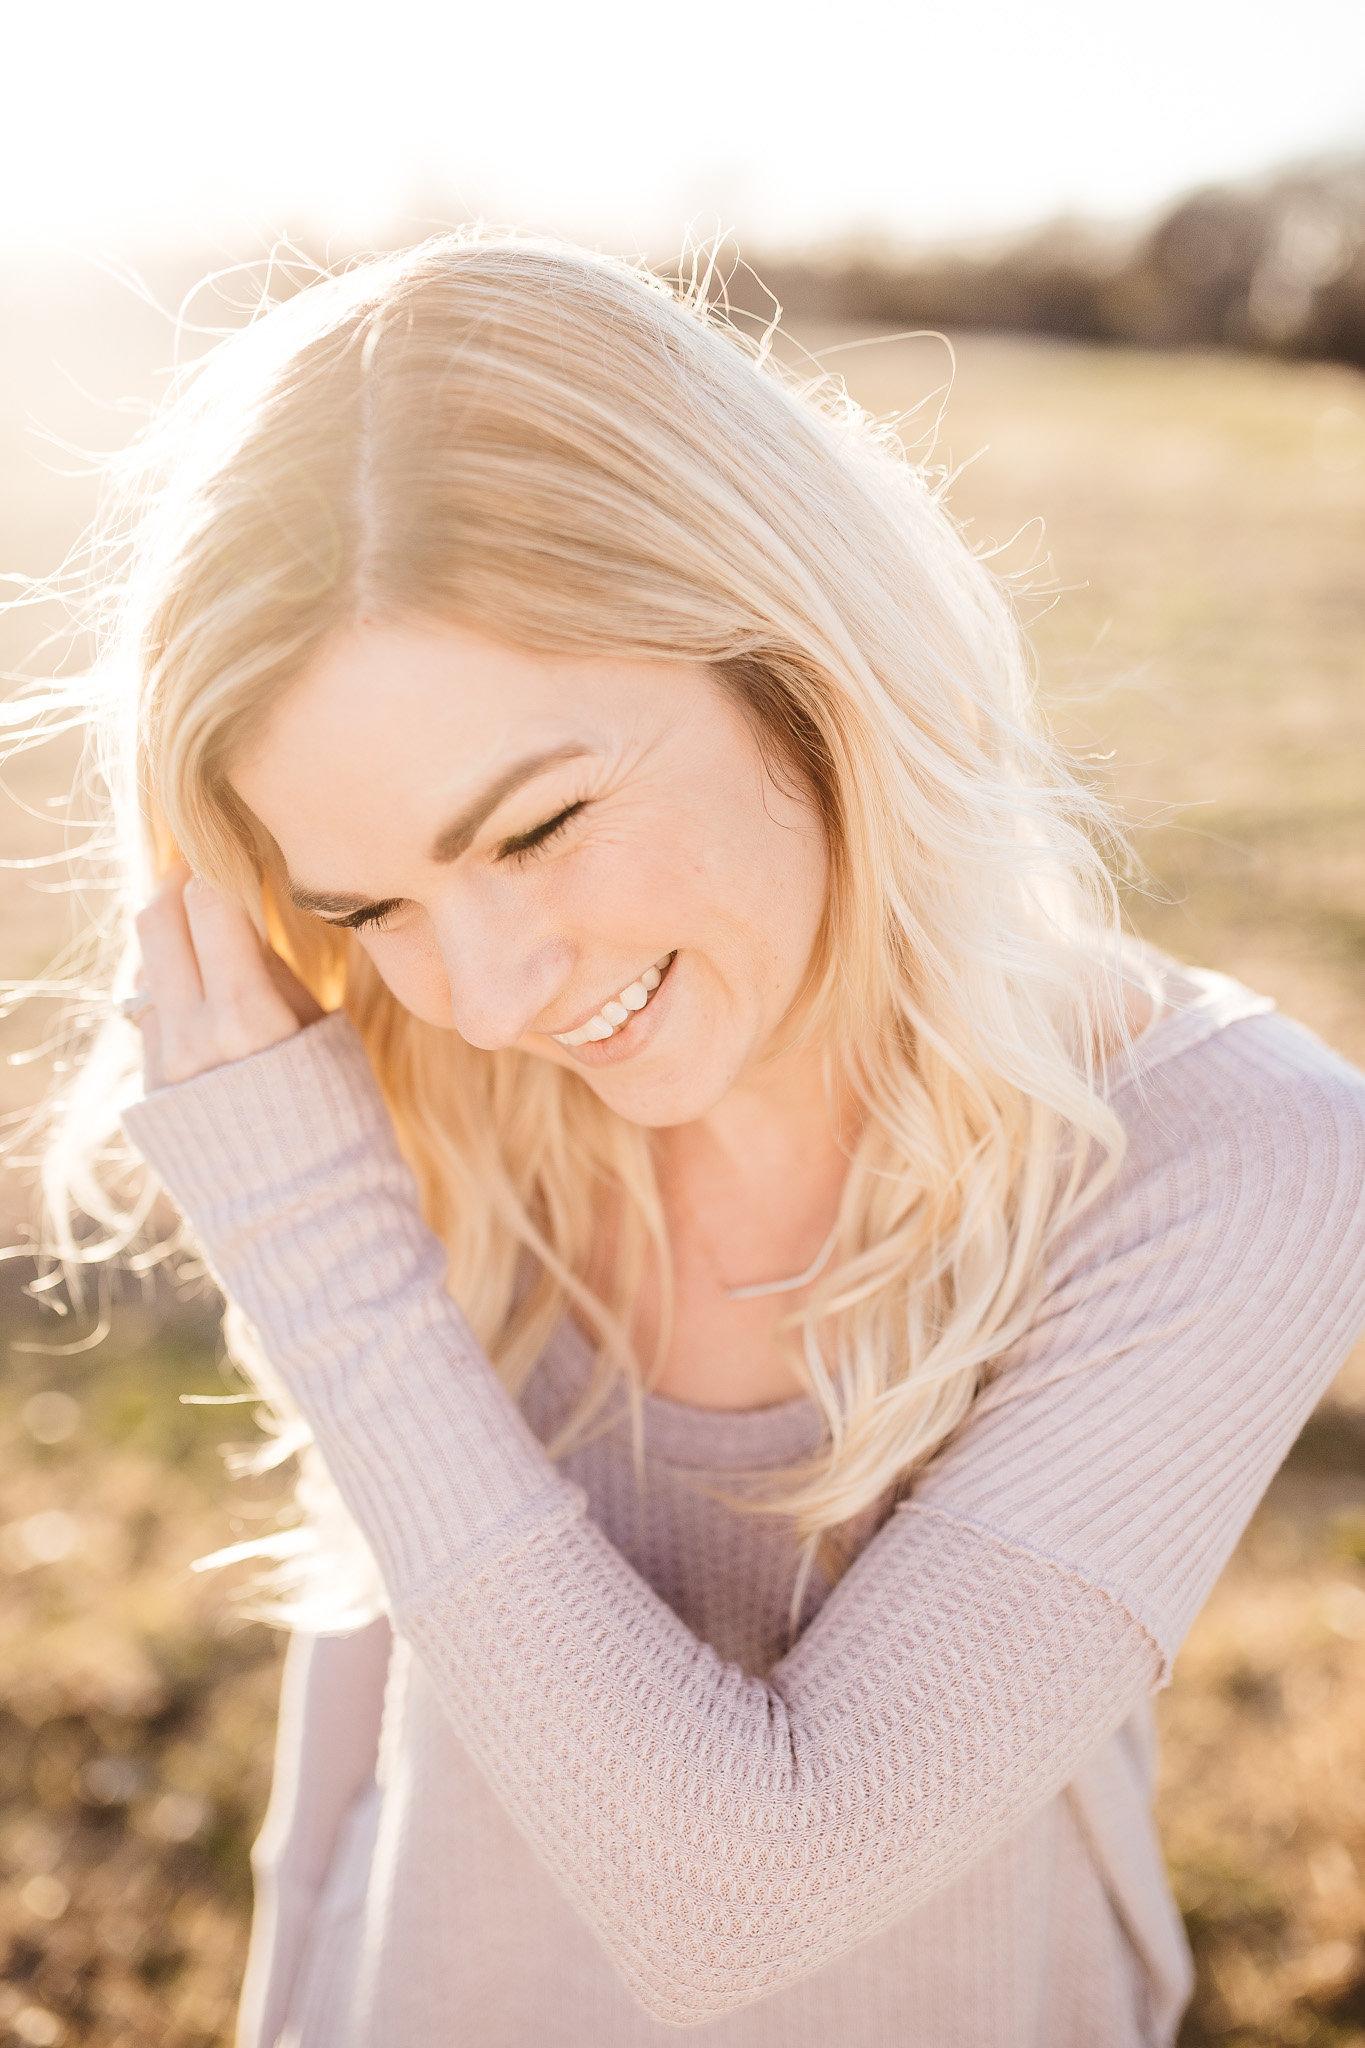 Alexa-Vossler_Brand-Photographer_Dallas-Photographer_Dallas-Portrait-Photographer-2.jpg